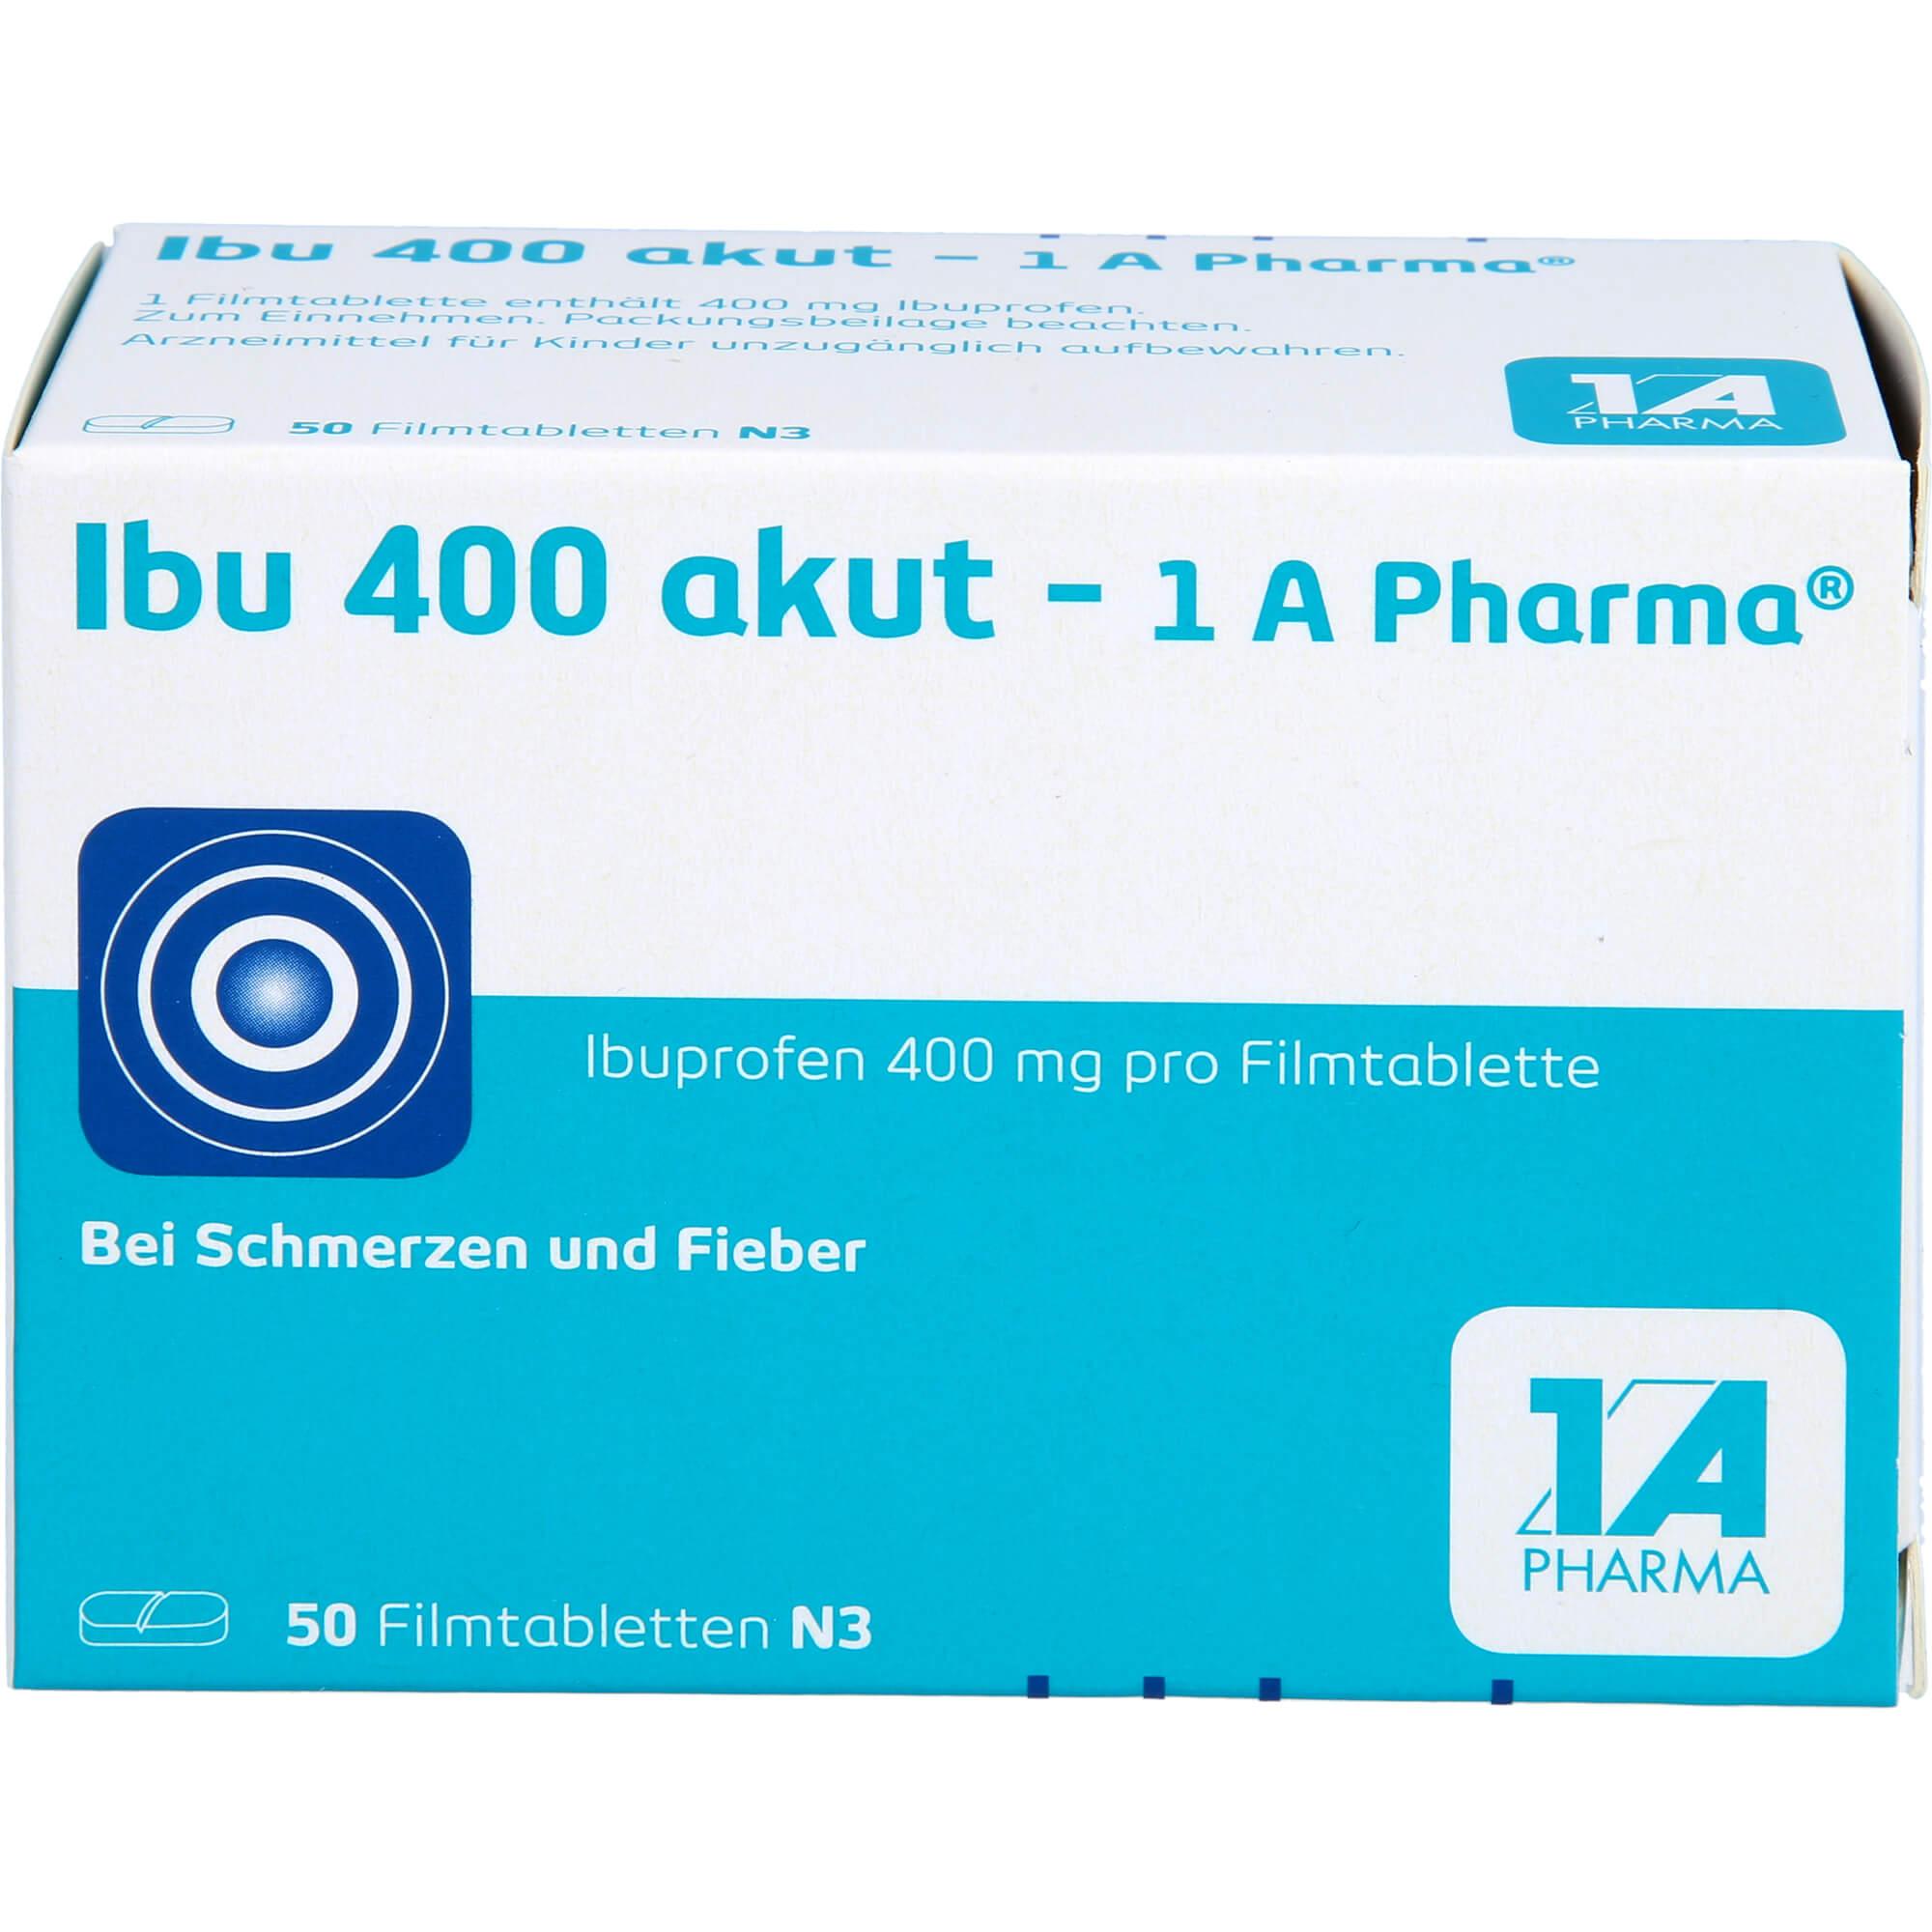 IBU-400-akut-1A-Pharma-Filmtabletten